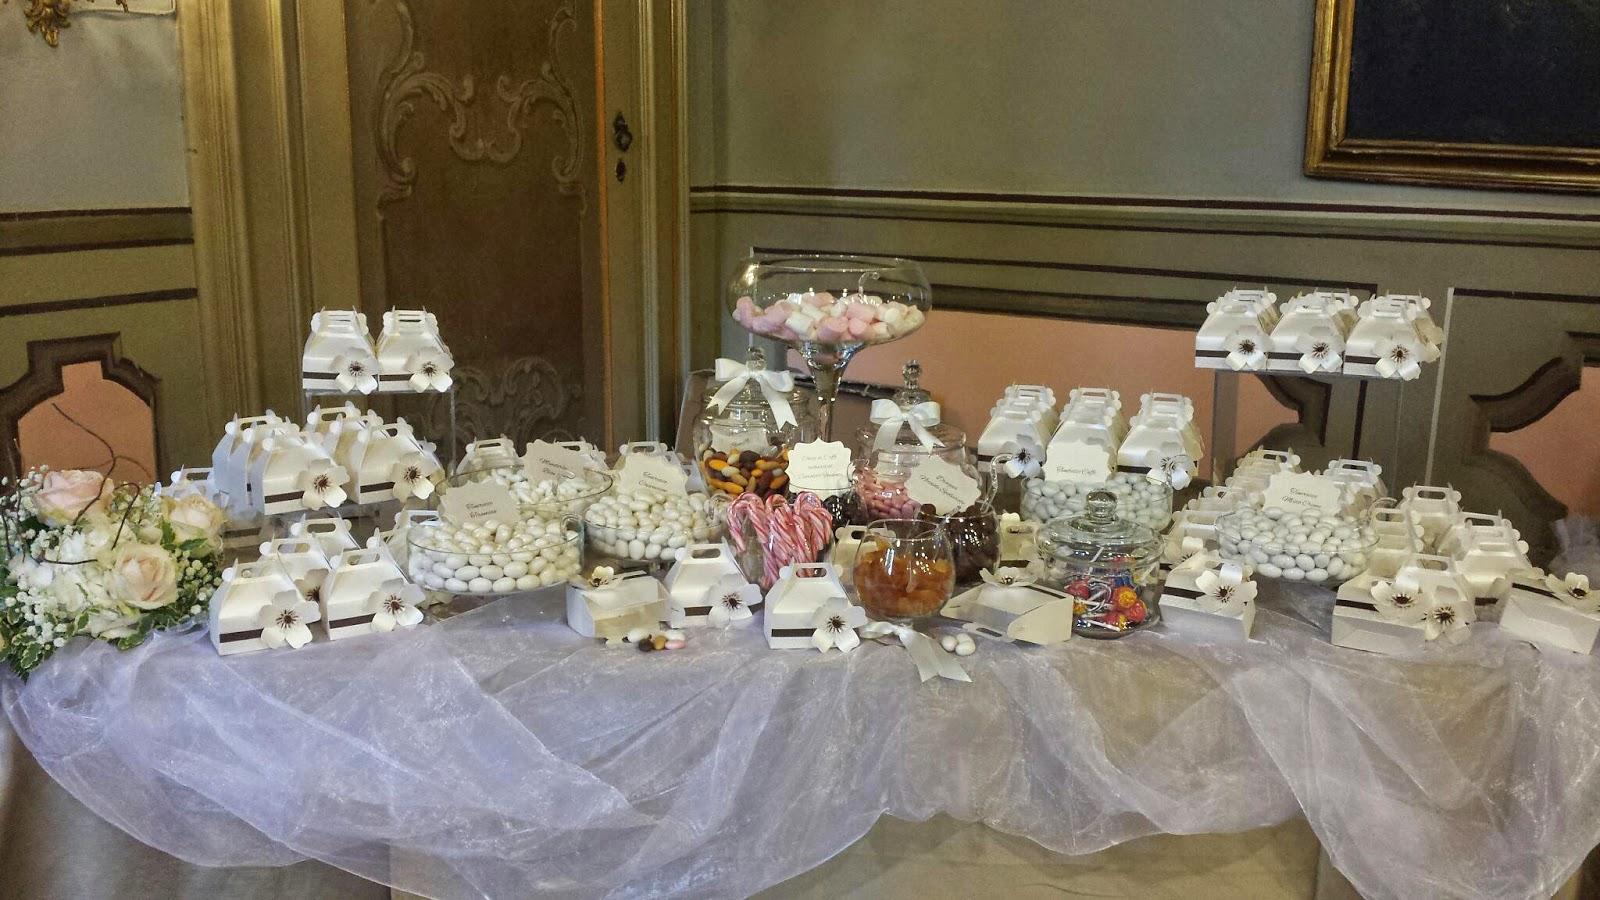 Matrimonio Tema Caffè : Matrimonio tema caffè